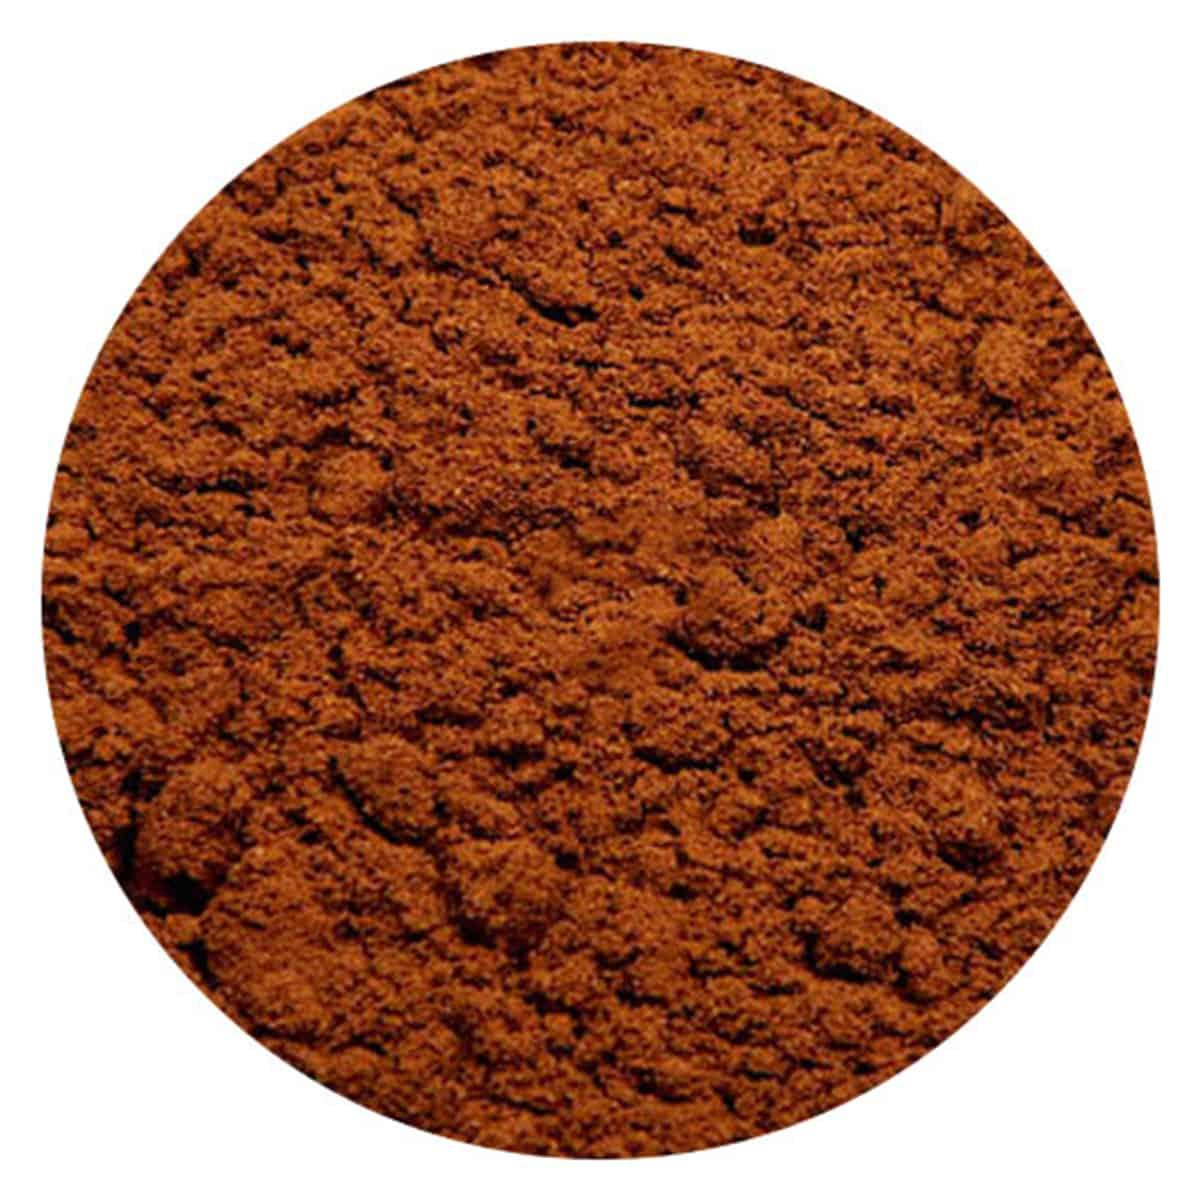 Buy IAG Foods Allspice (Pimento) Ground - 1 kg